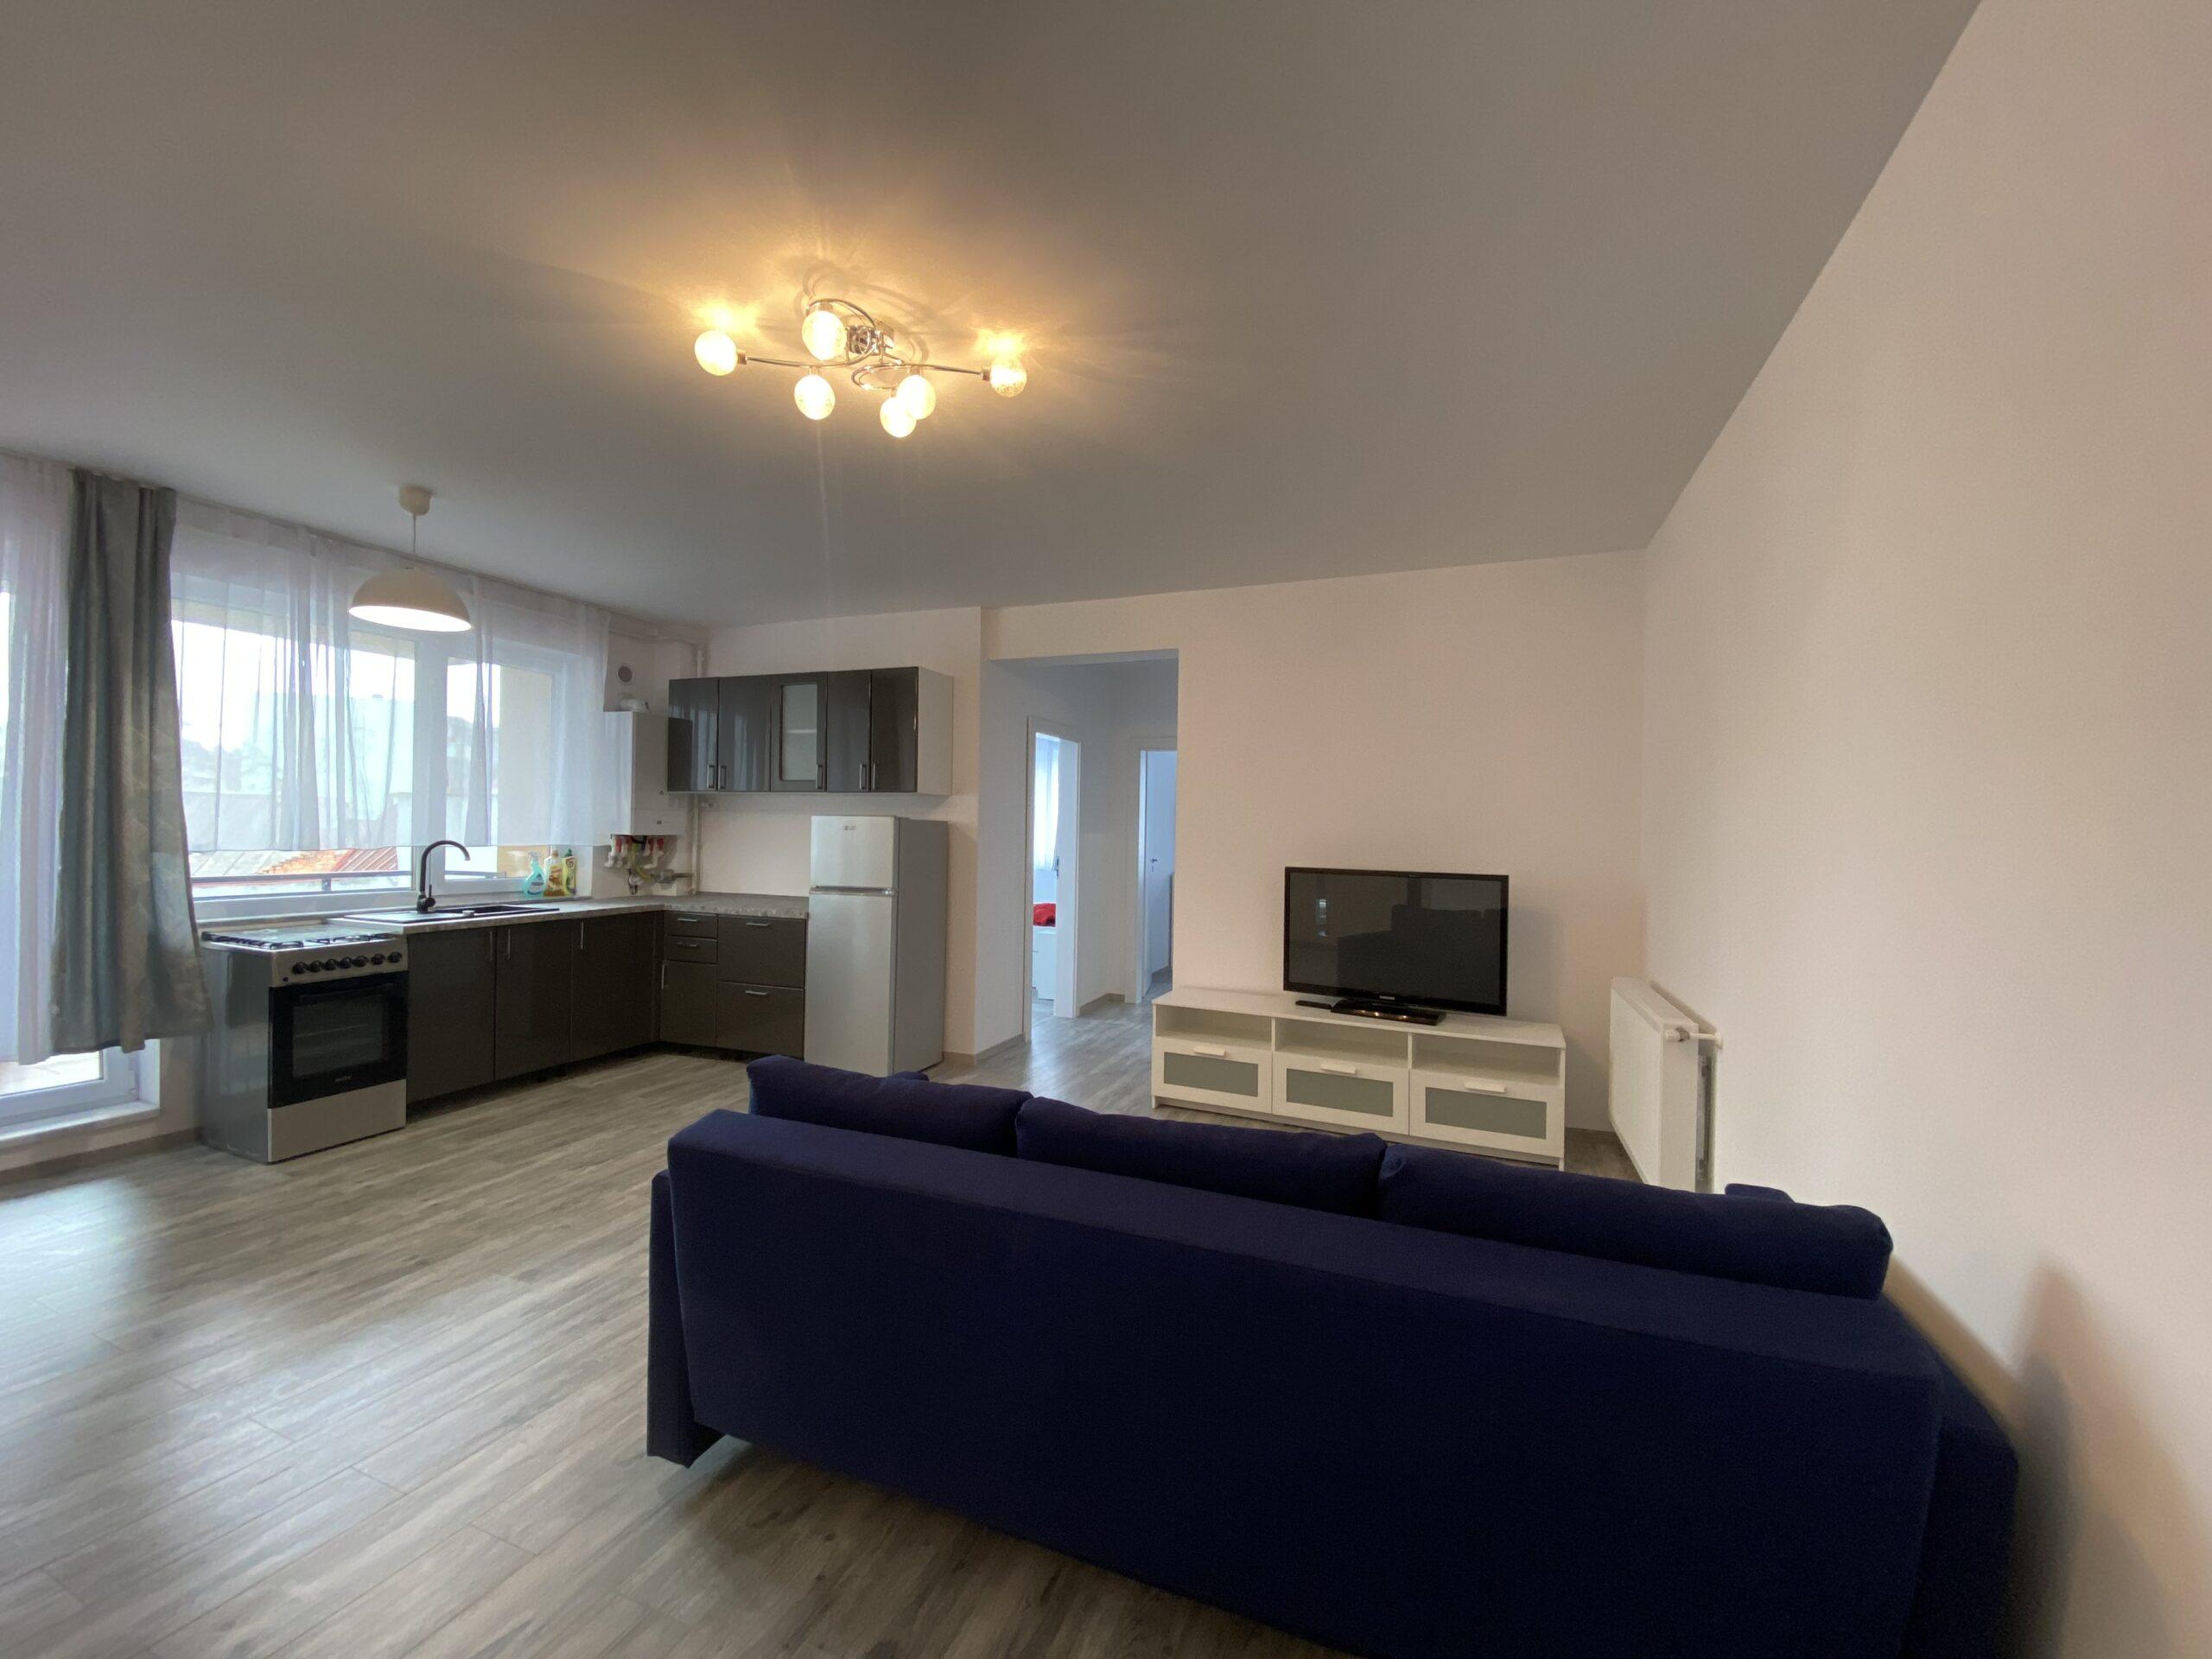 189394-Inchiriere apartament 3 camere, Zona Pta.M.Viteazul, Cluj-Napoca